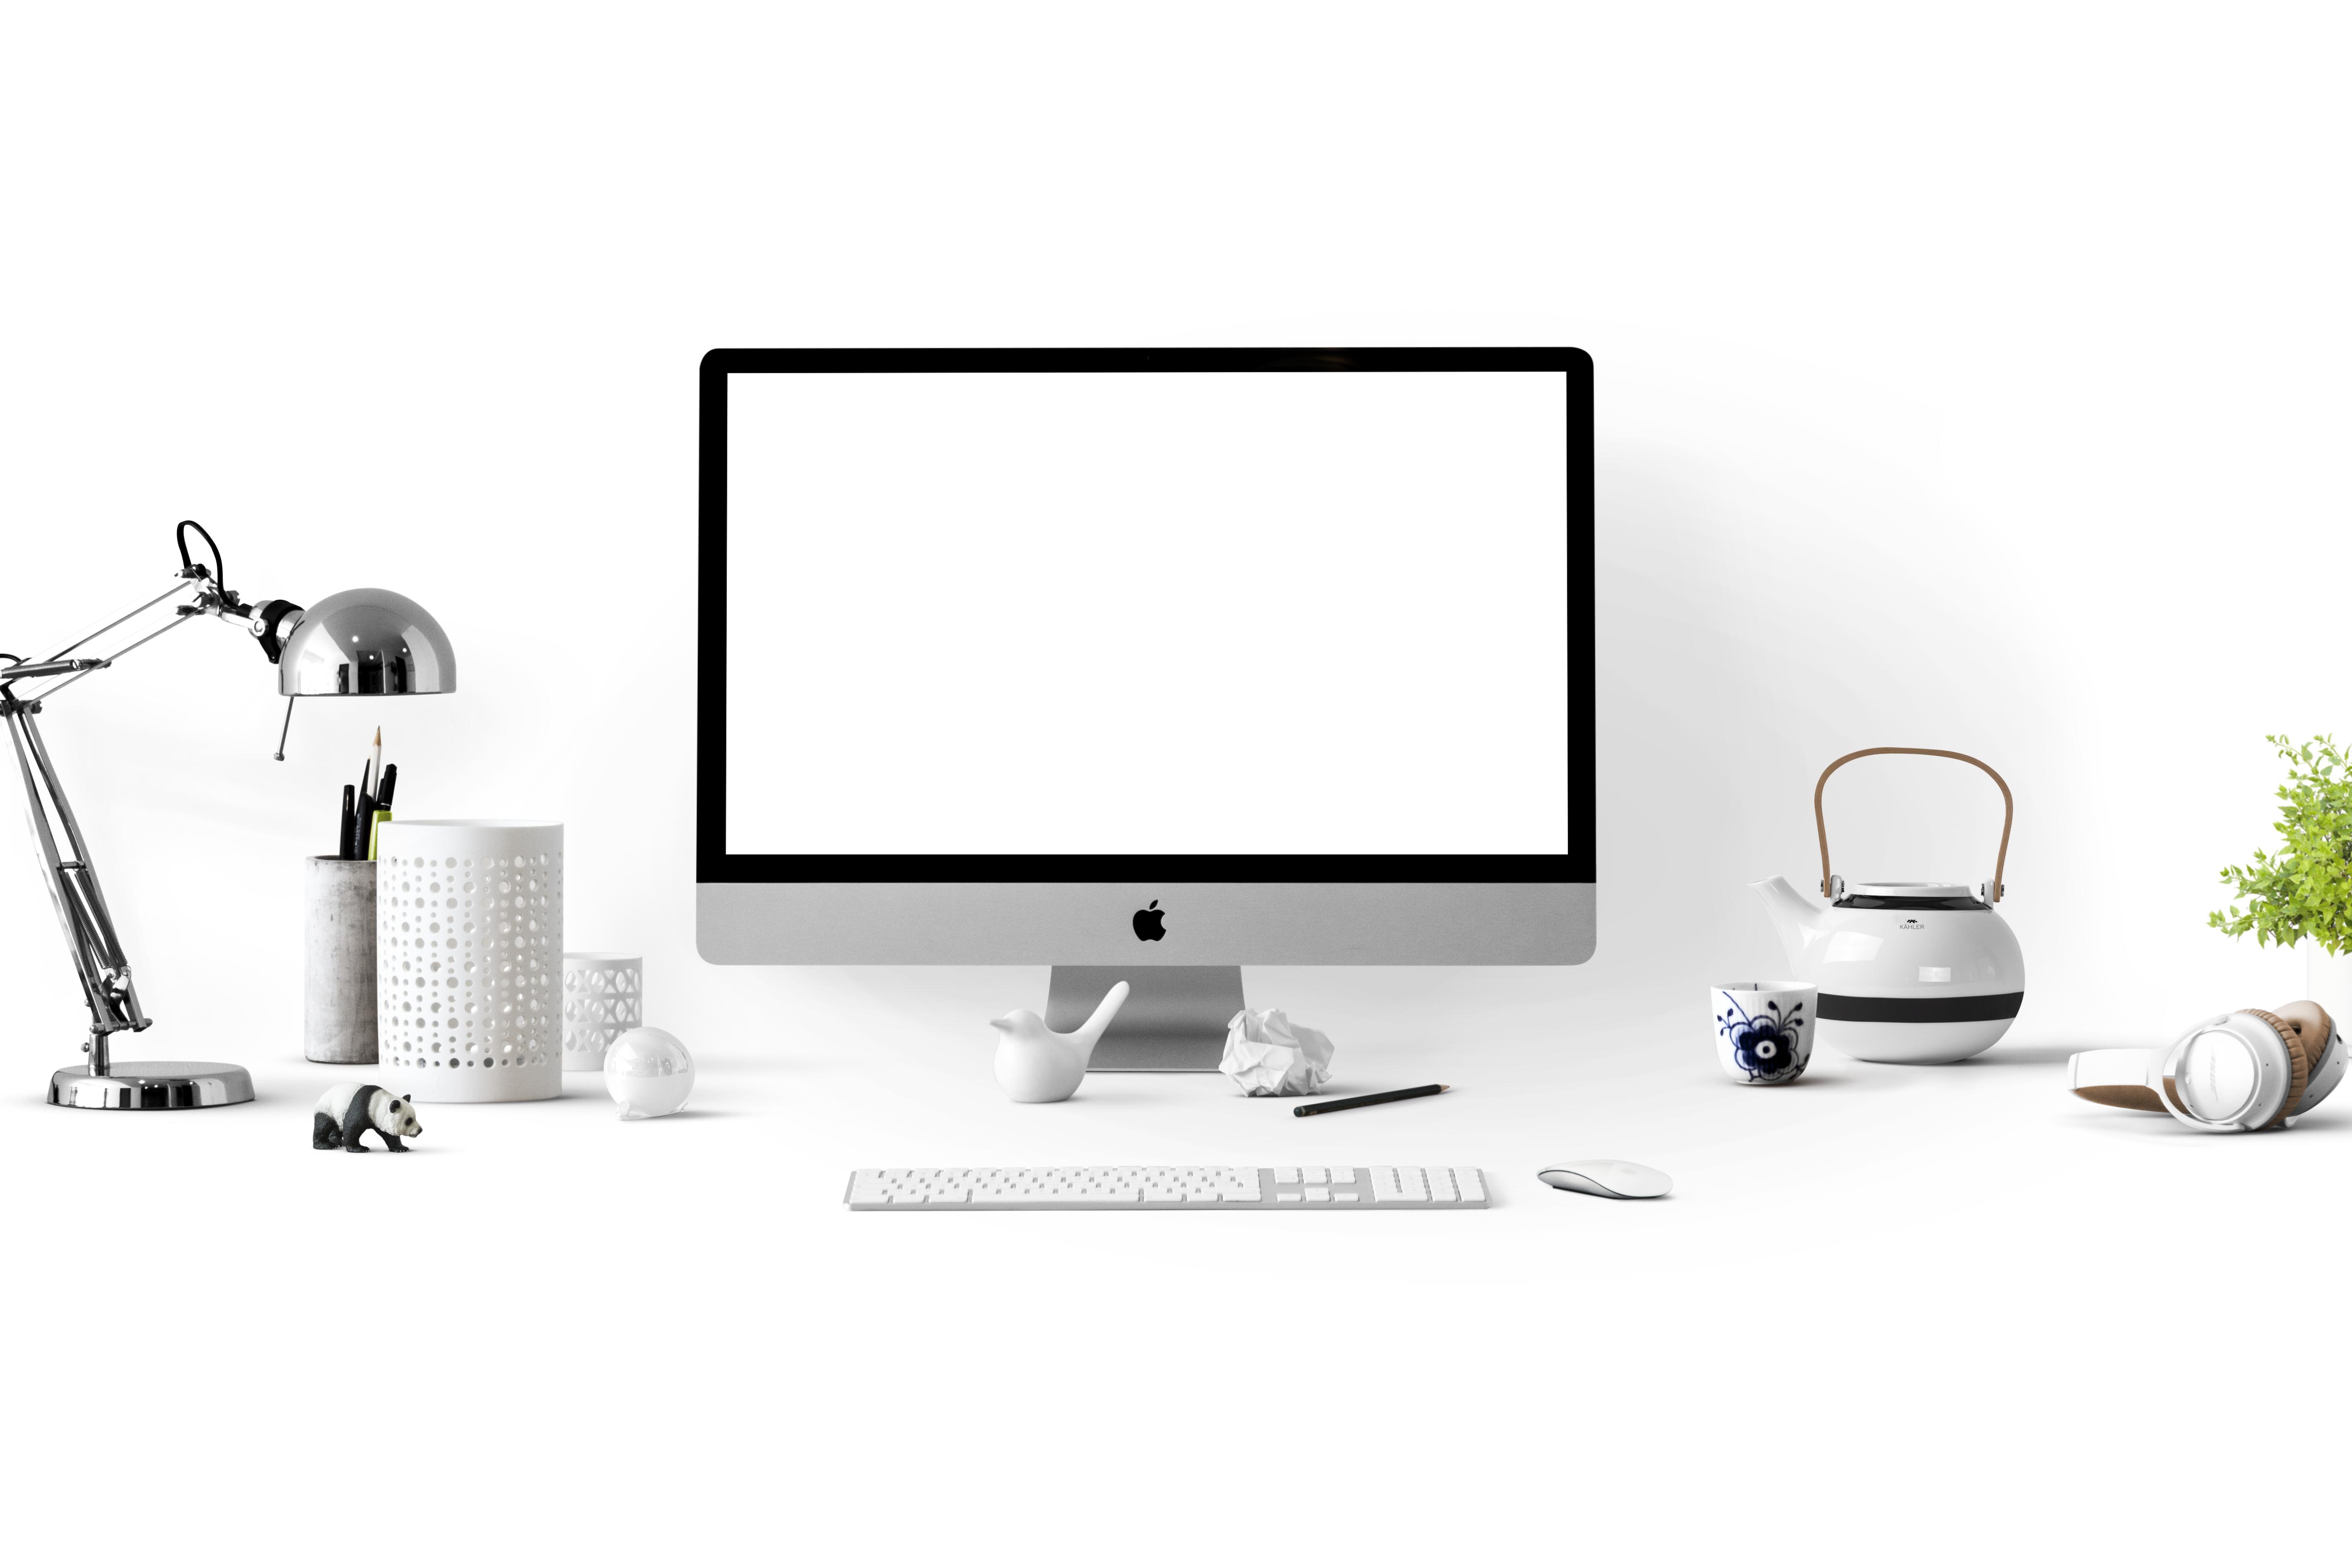 MWF_Case_Study_Computer_on_Desk